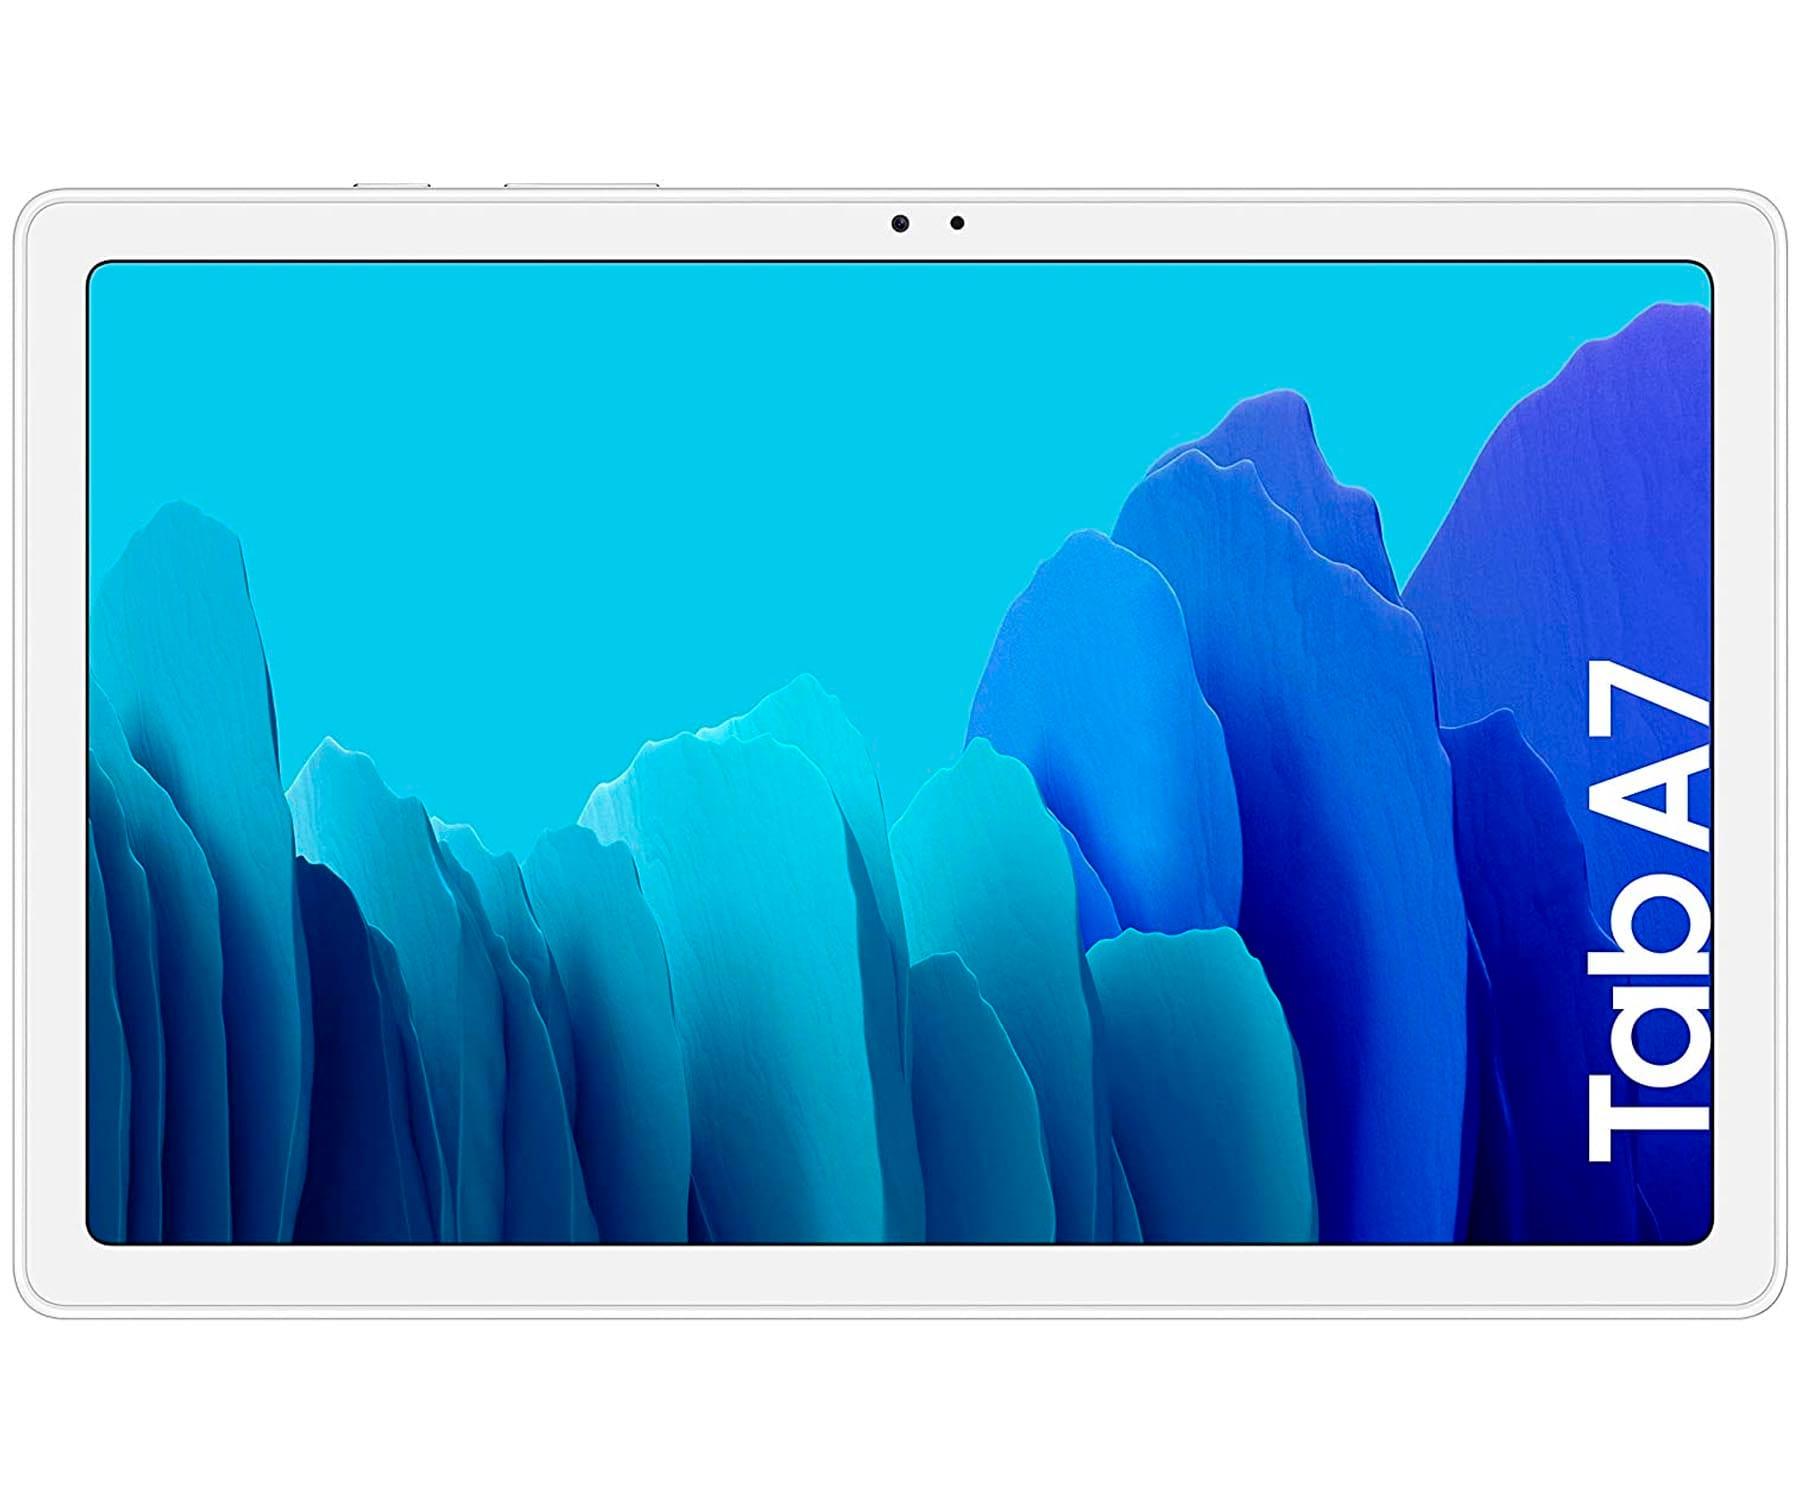 SAMSUNG GALAXY TAB A7 PLATA TABLET WIFI 10.4'' WUXGA+ OCTACORE 32GB 3GB RAM CAM 8MP SELFIES 5MP